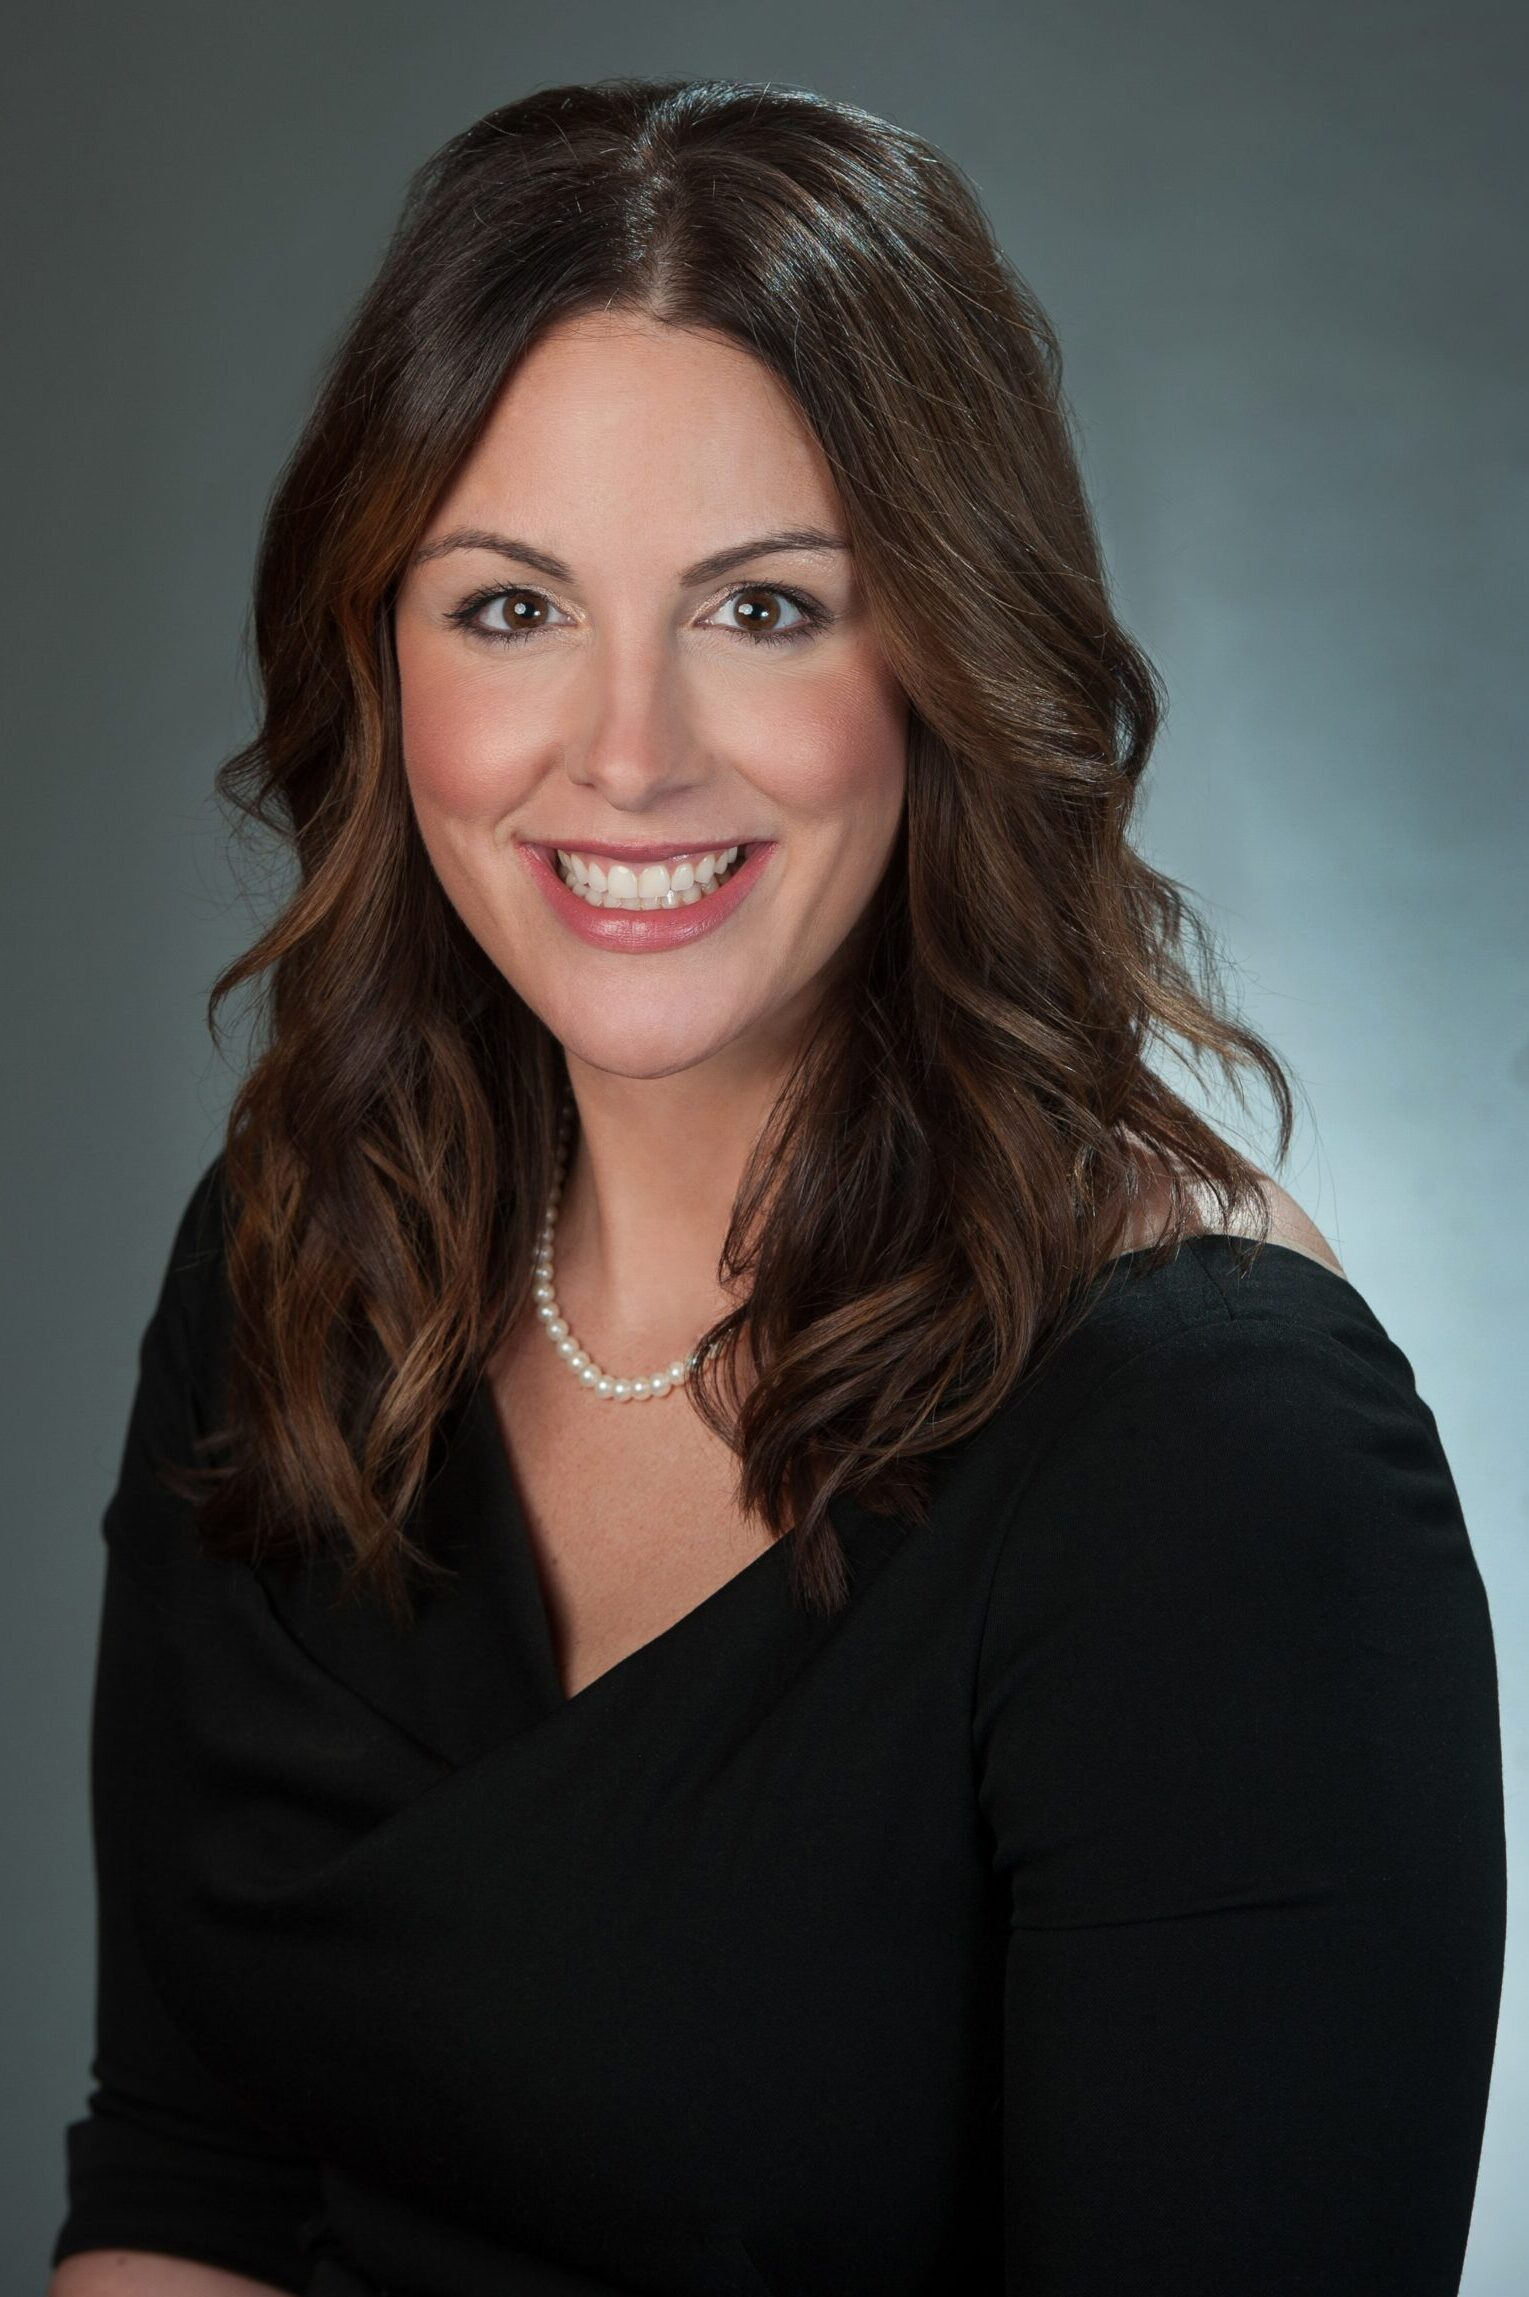 Jennifer Coughlin (Moderator)